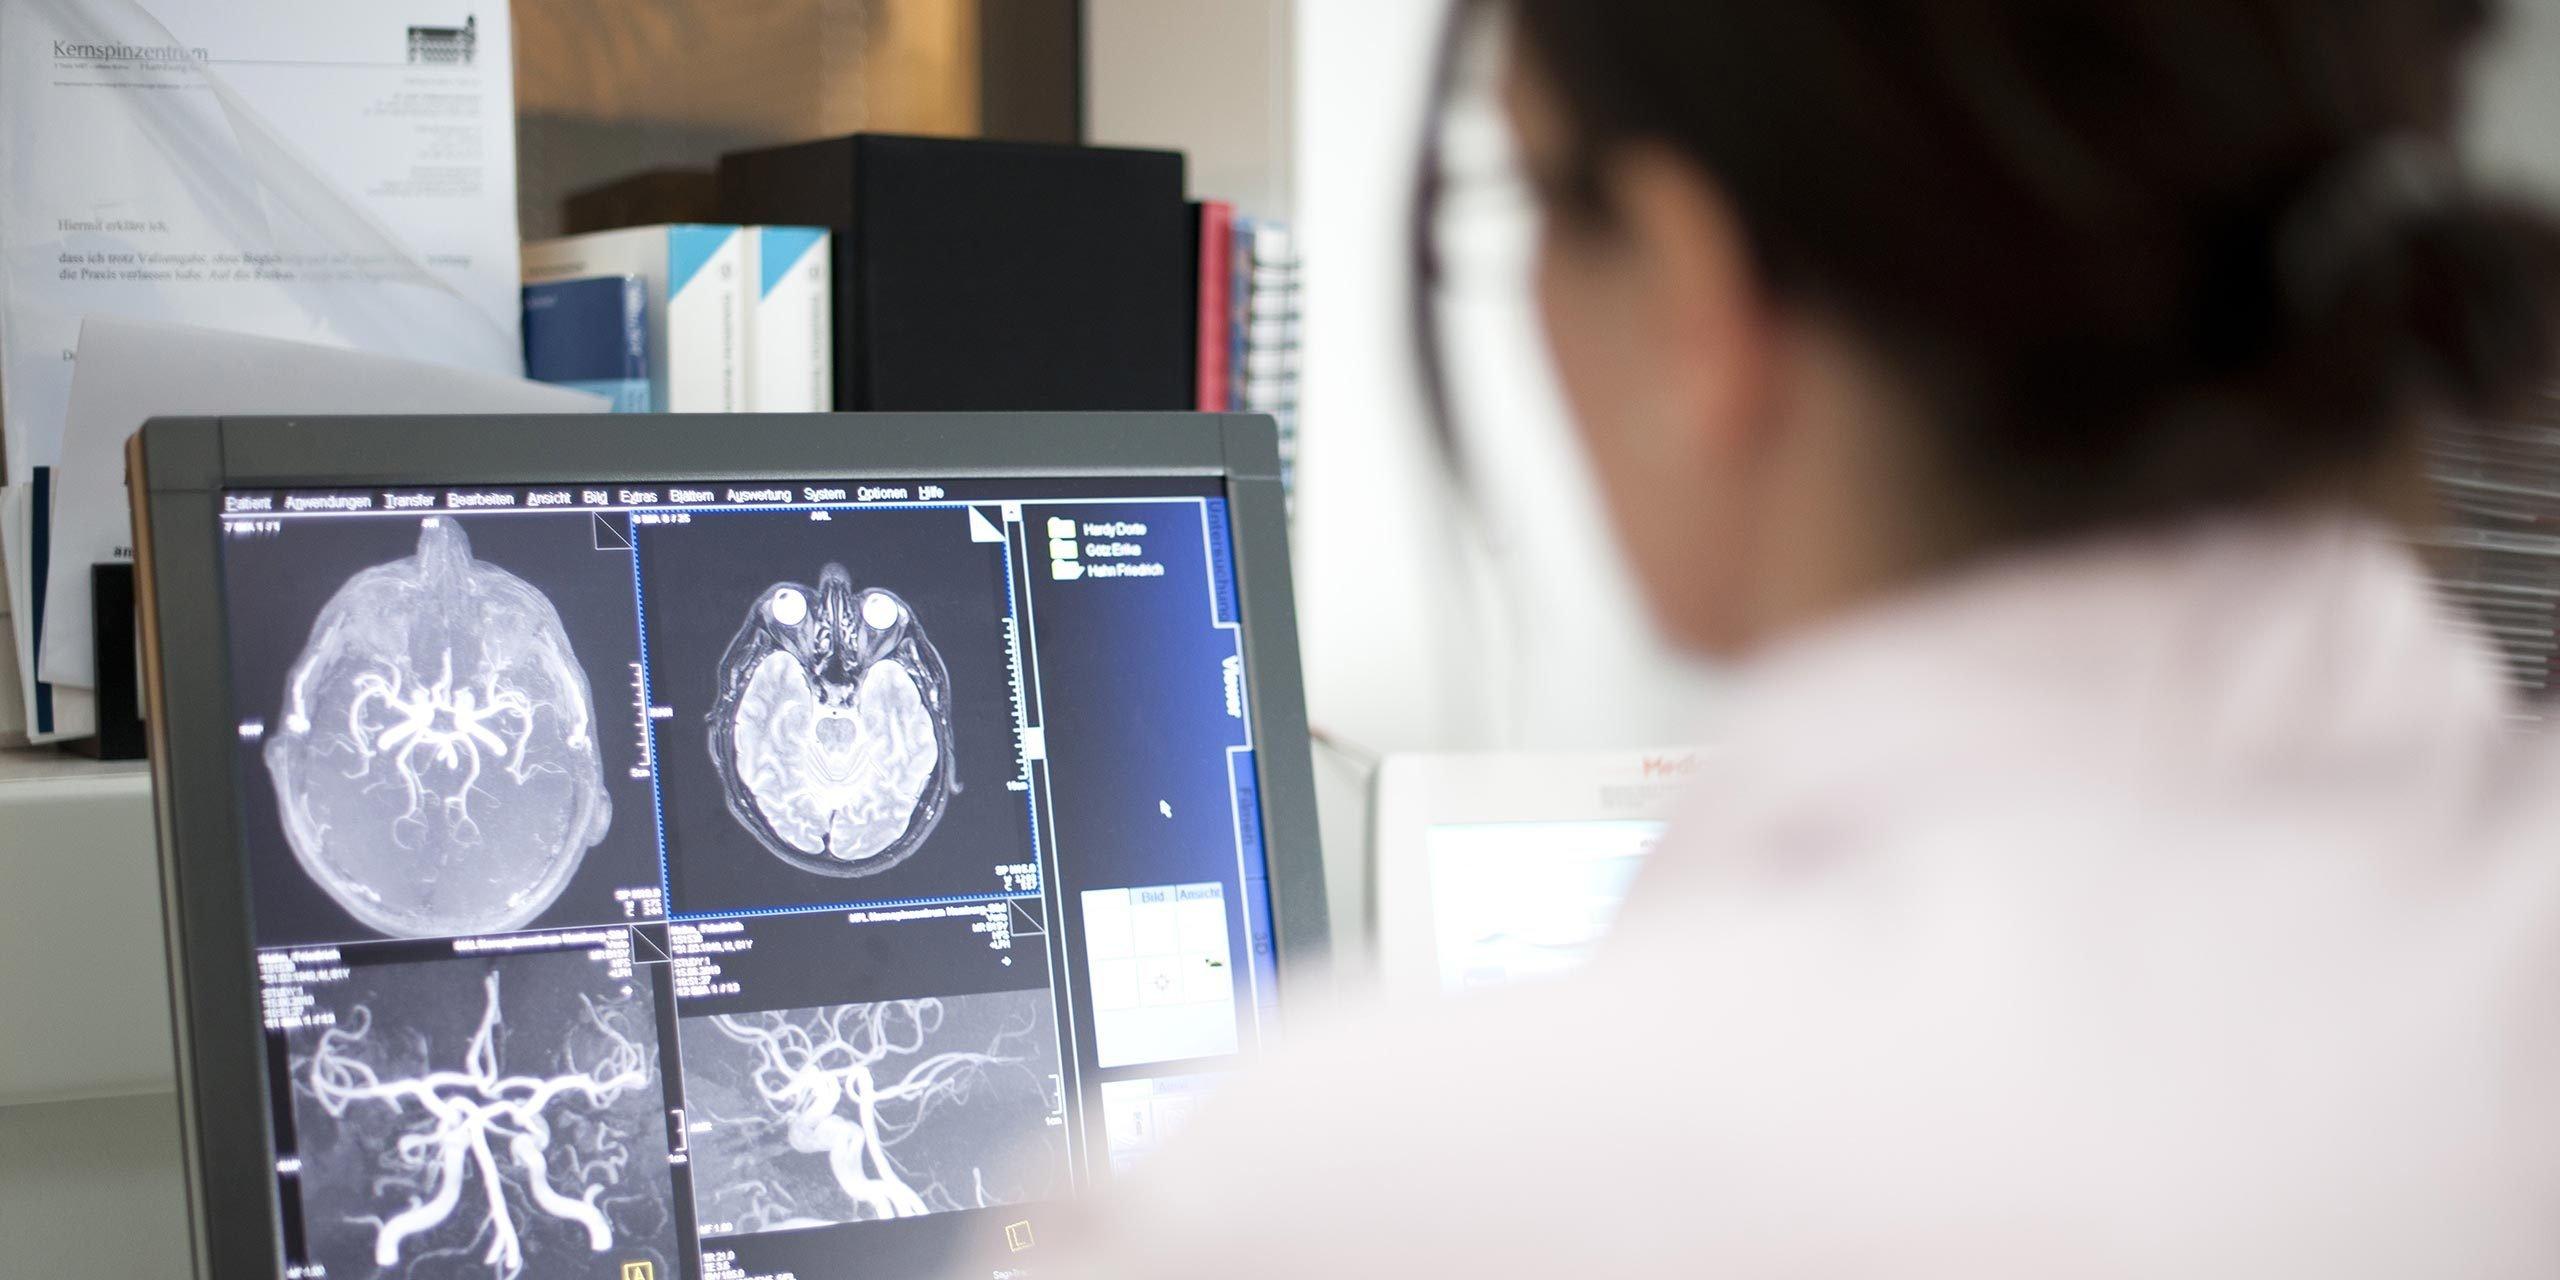 Radiologikum - Eppendorfer-Baum - Computertomographie (CT)